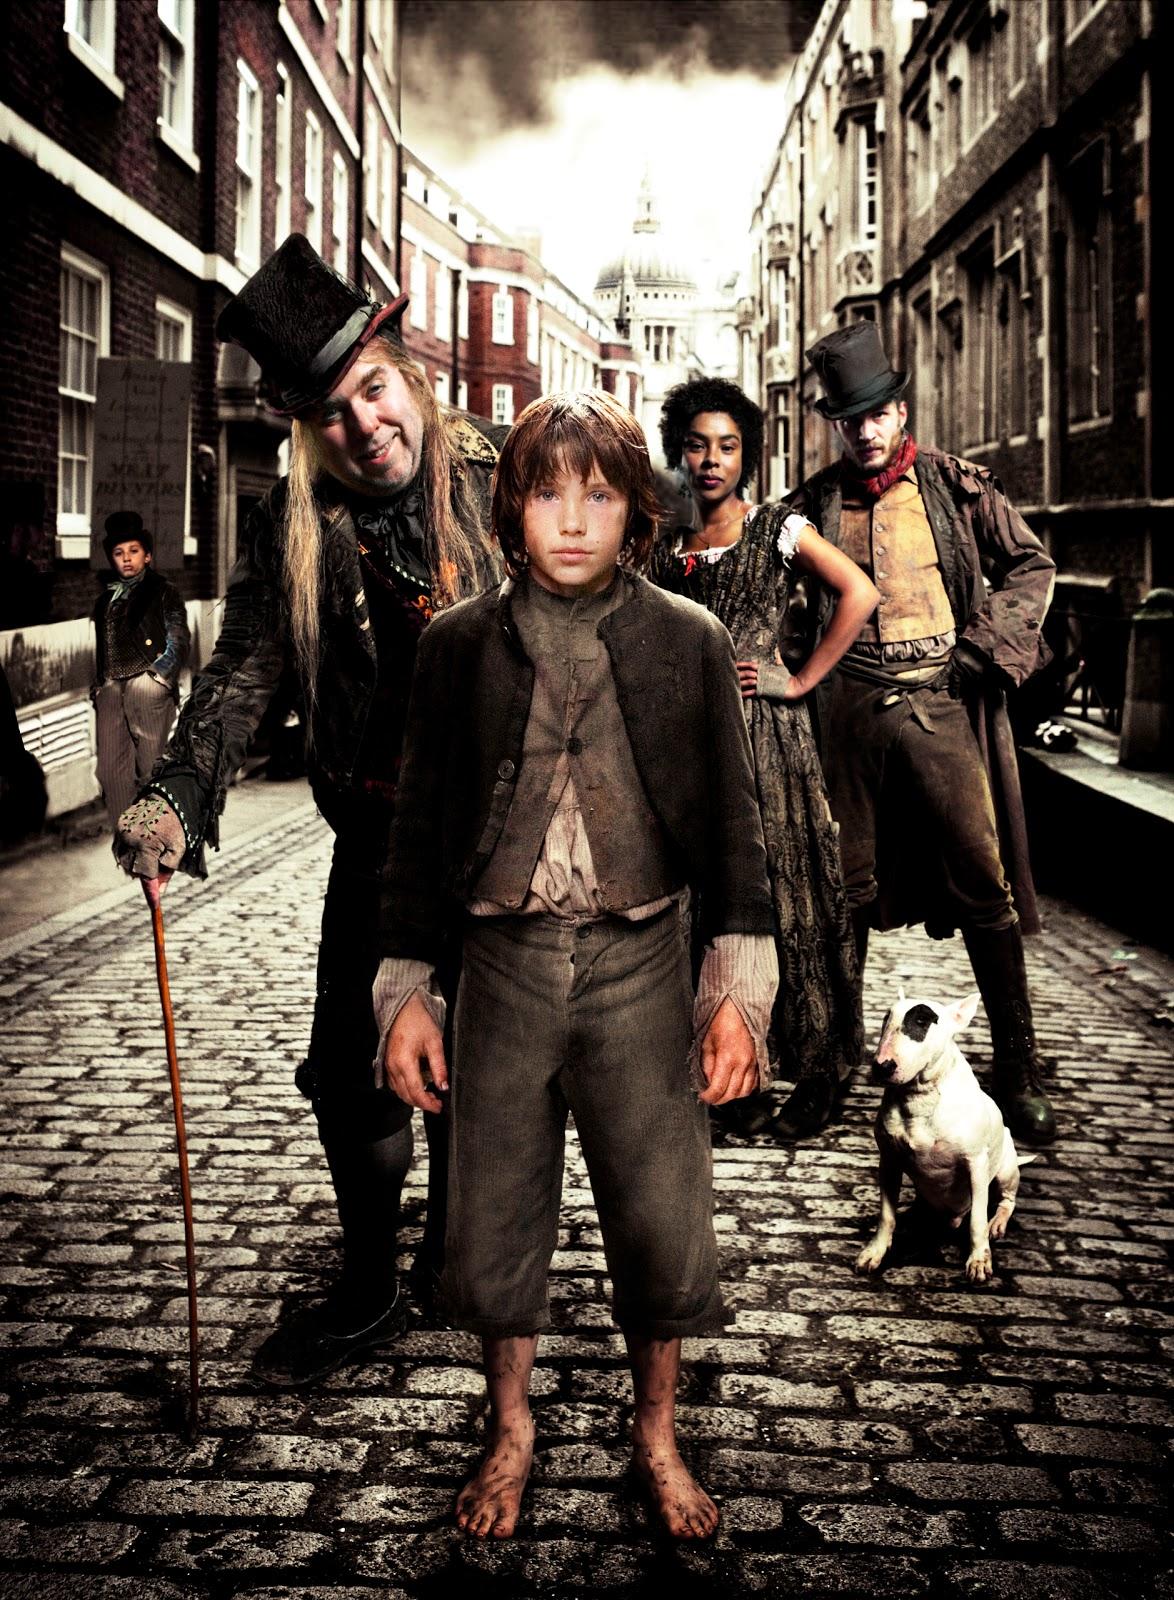 The Jane Austen Film Club Oliver Twist BBC 2007 1174x1600